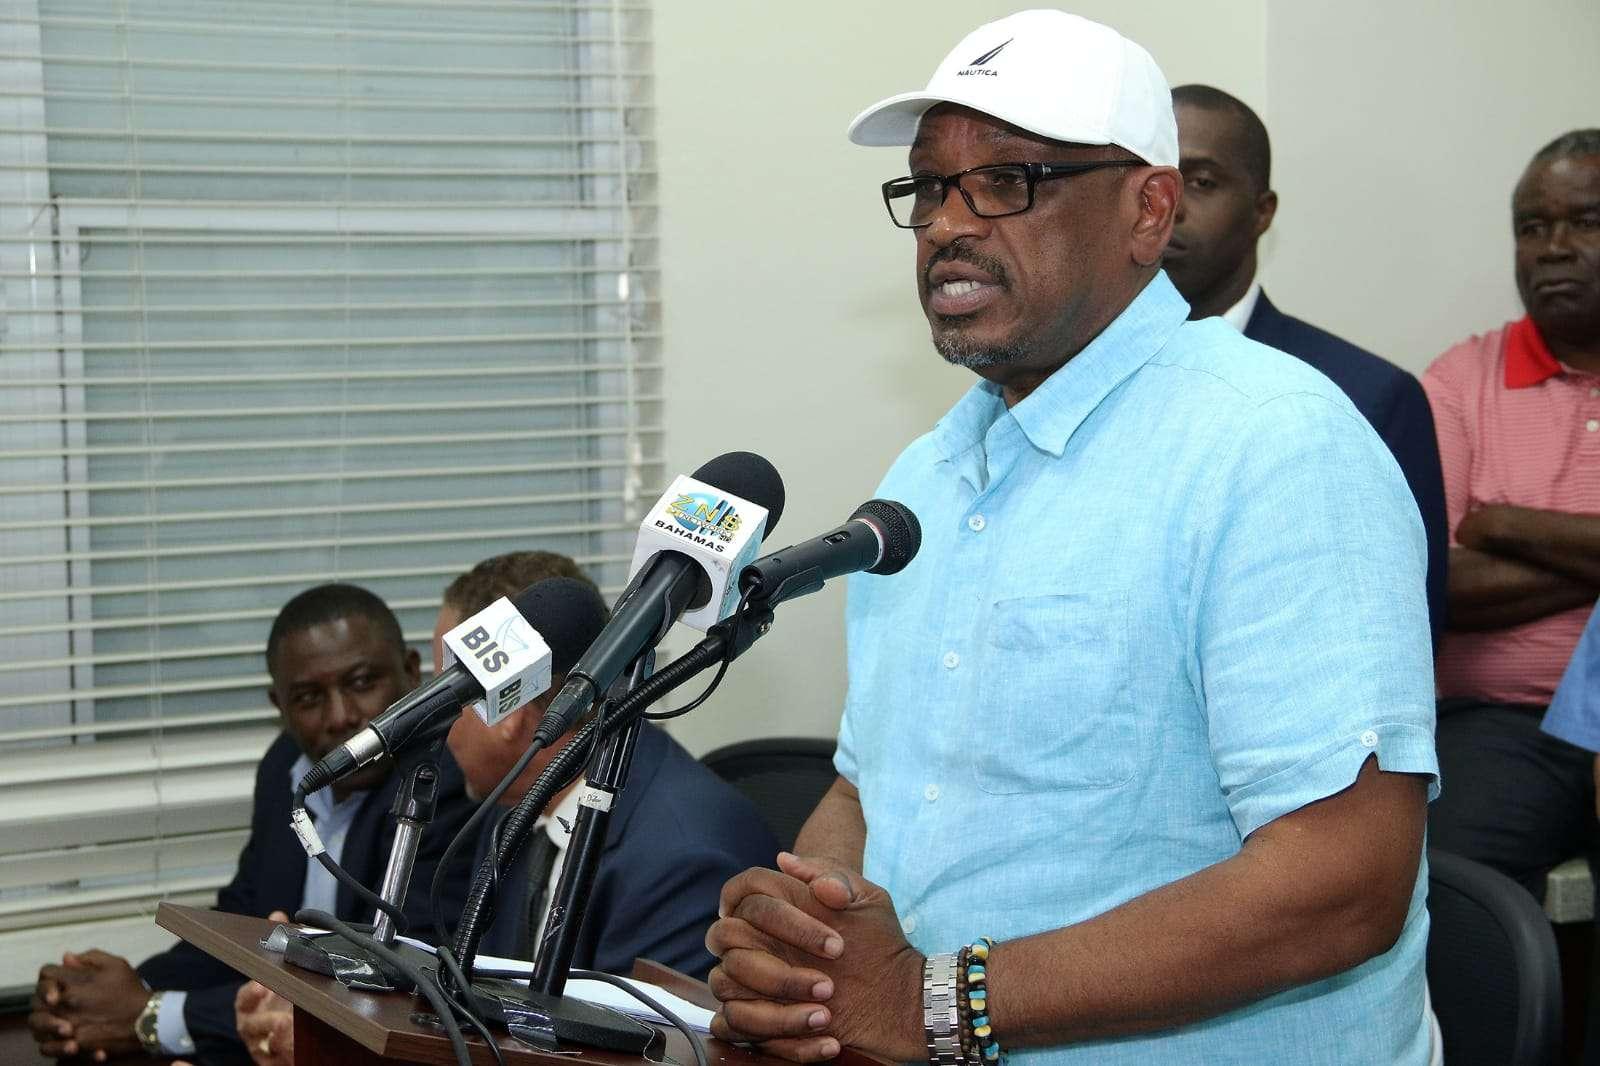 Hurricane Dorian Death Toll Rises to 7, Bahamas PM Says